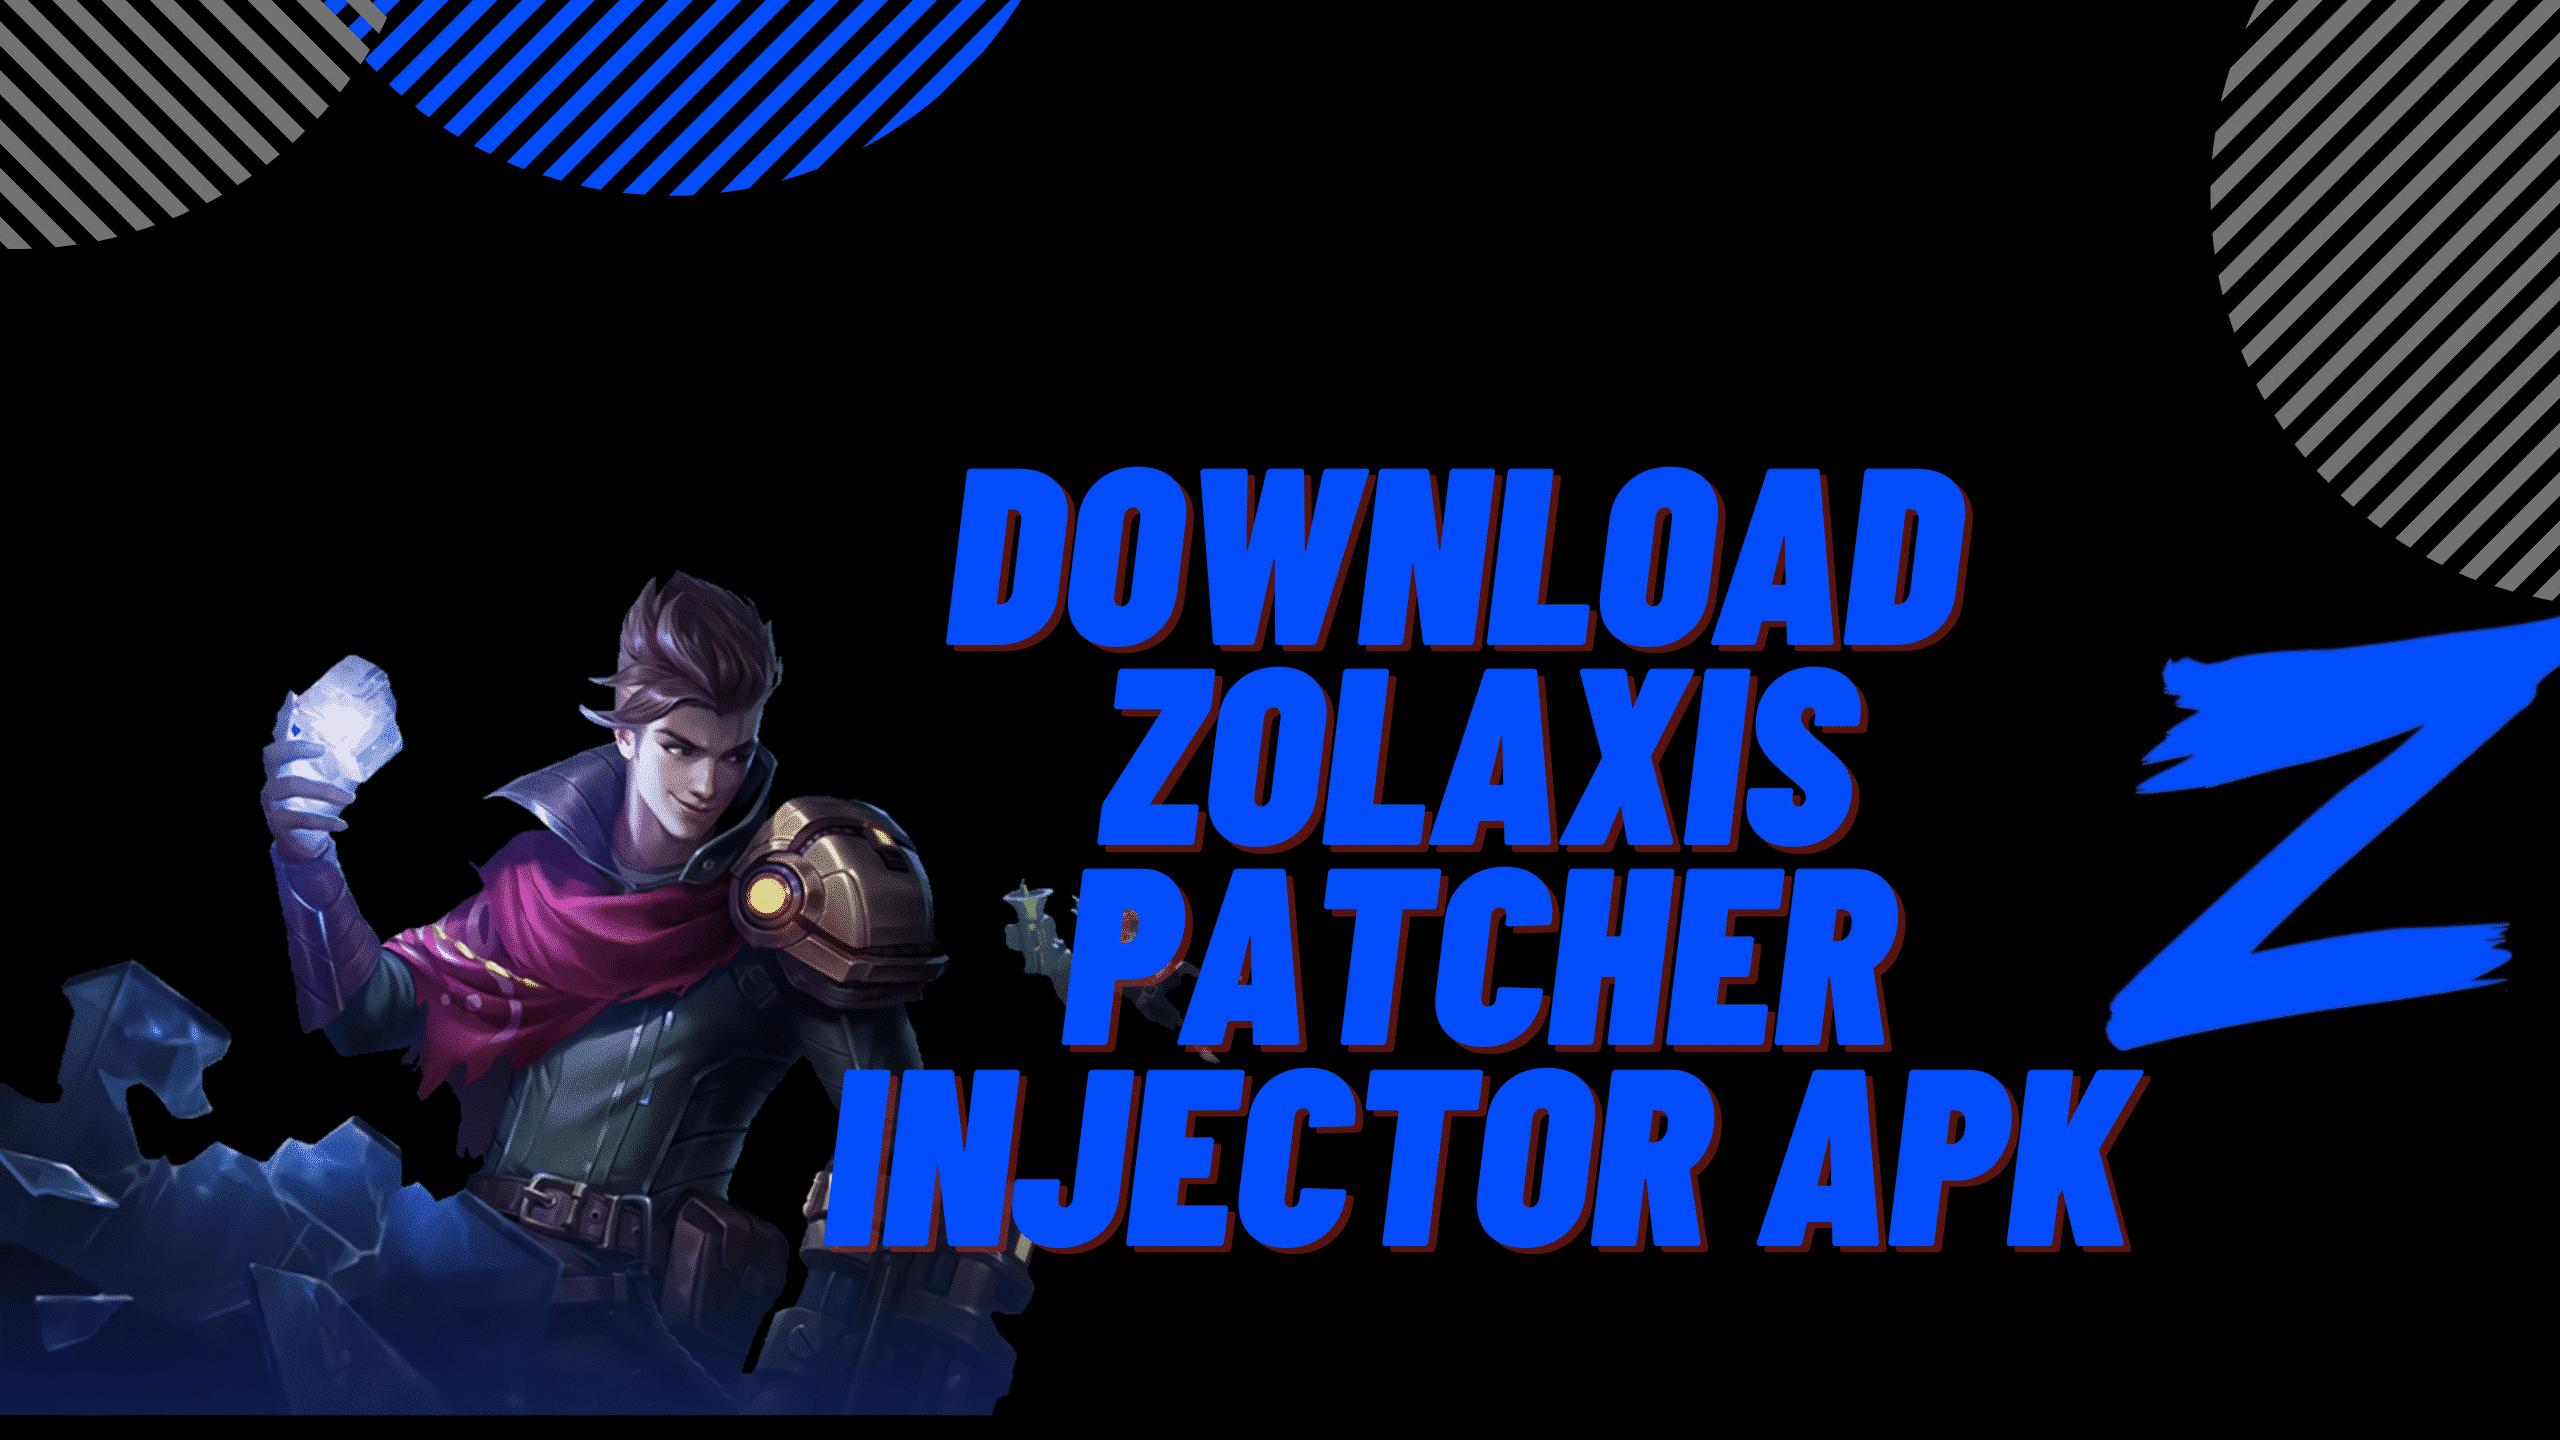 Link-Download-Zolaxis-Patcher-Apk-Mod